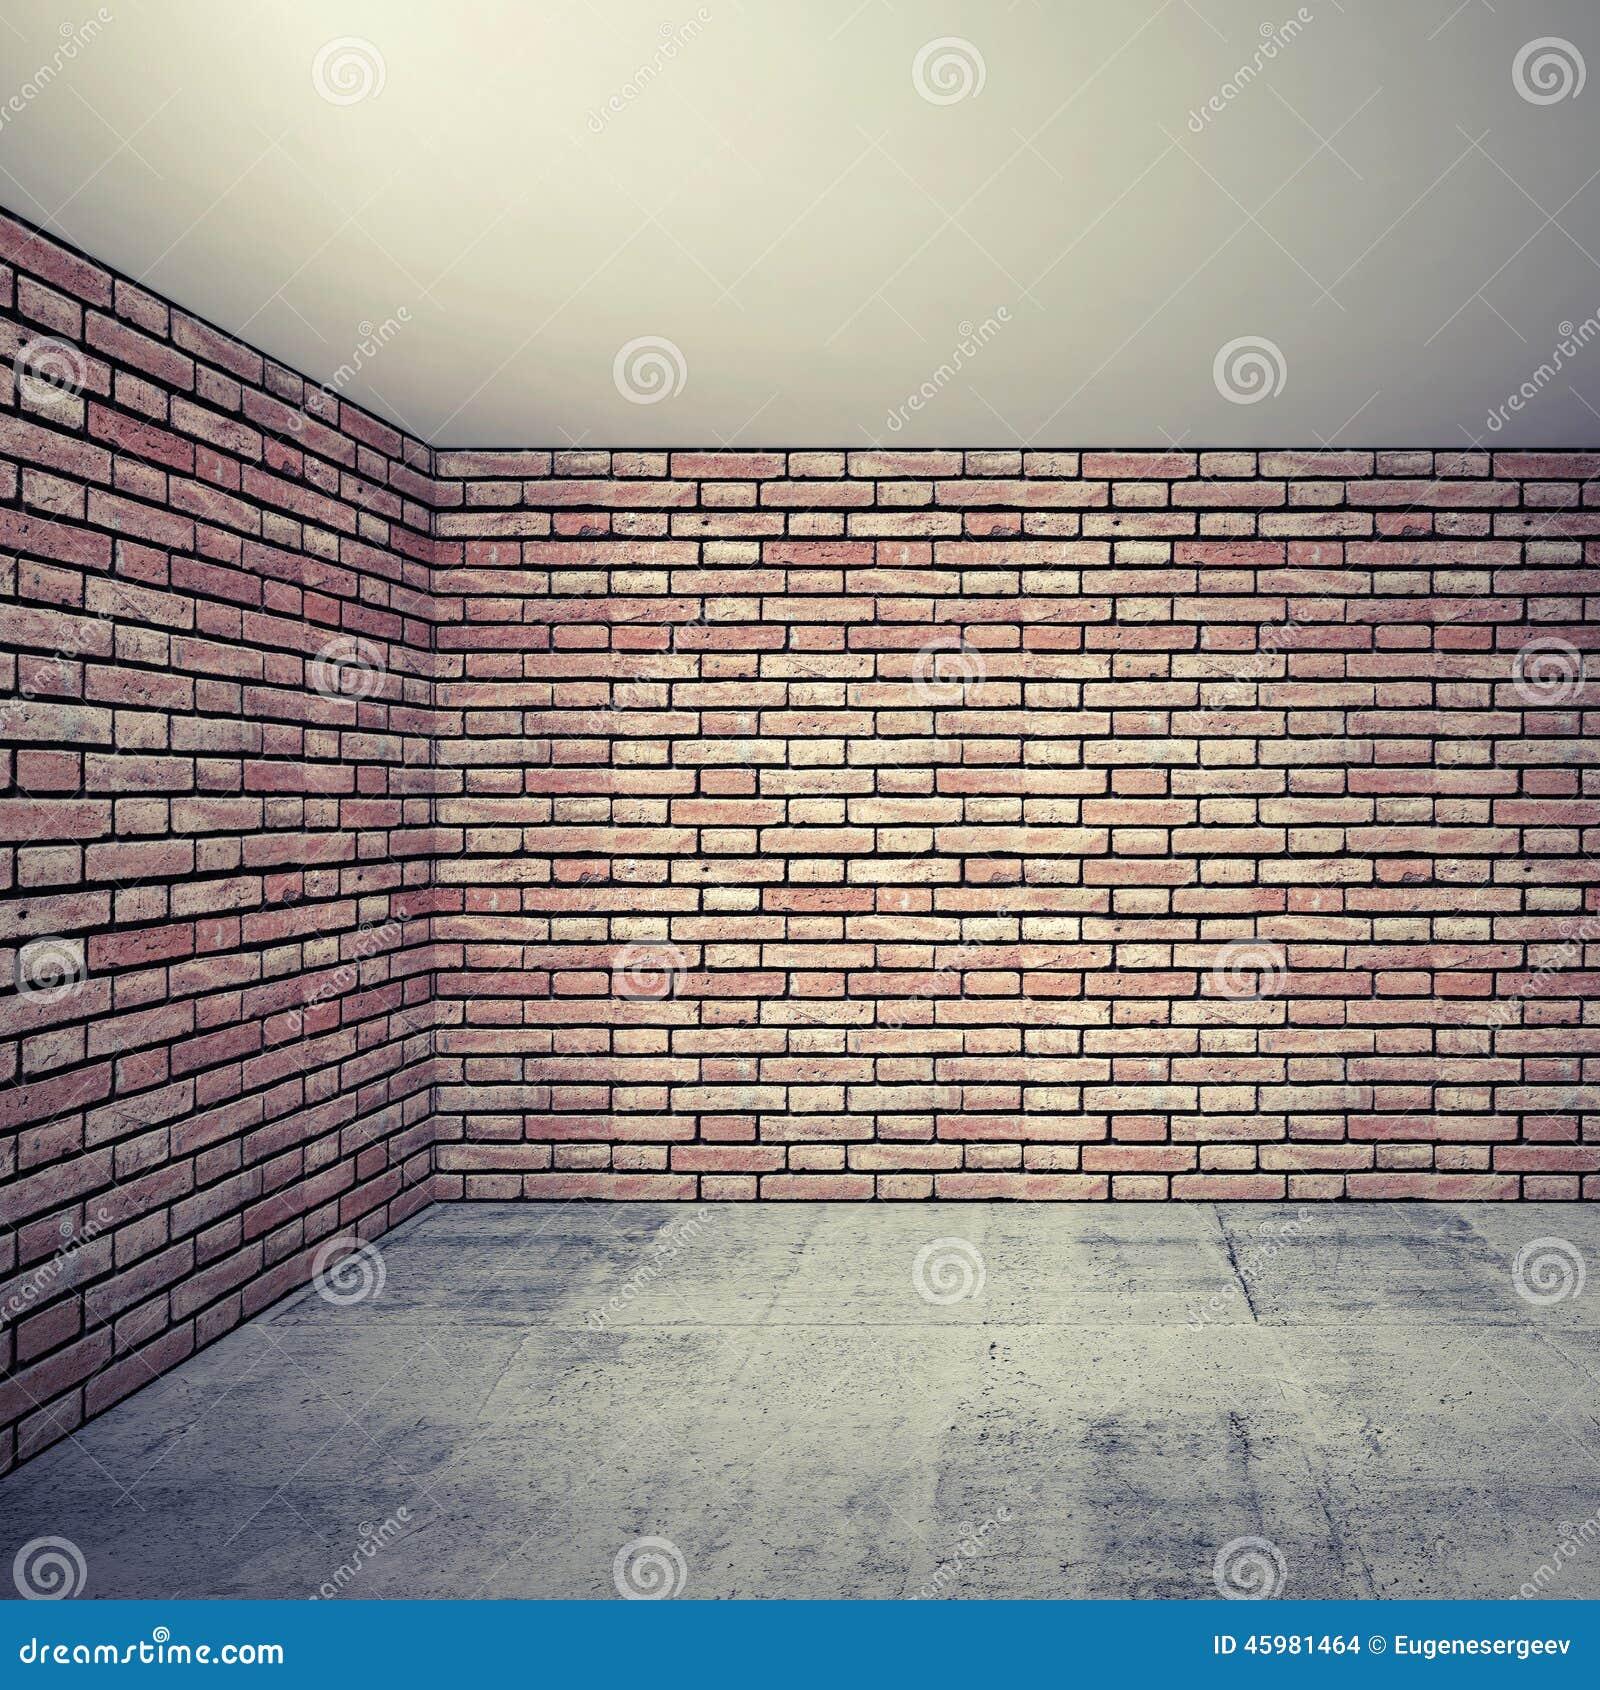 Interior Brick Flooring Pricing : Empty room interior with red brick walls and concrete